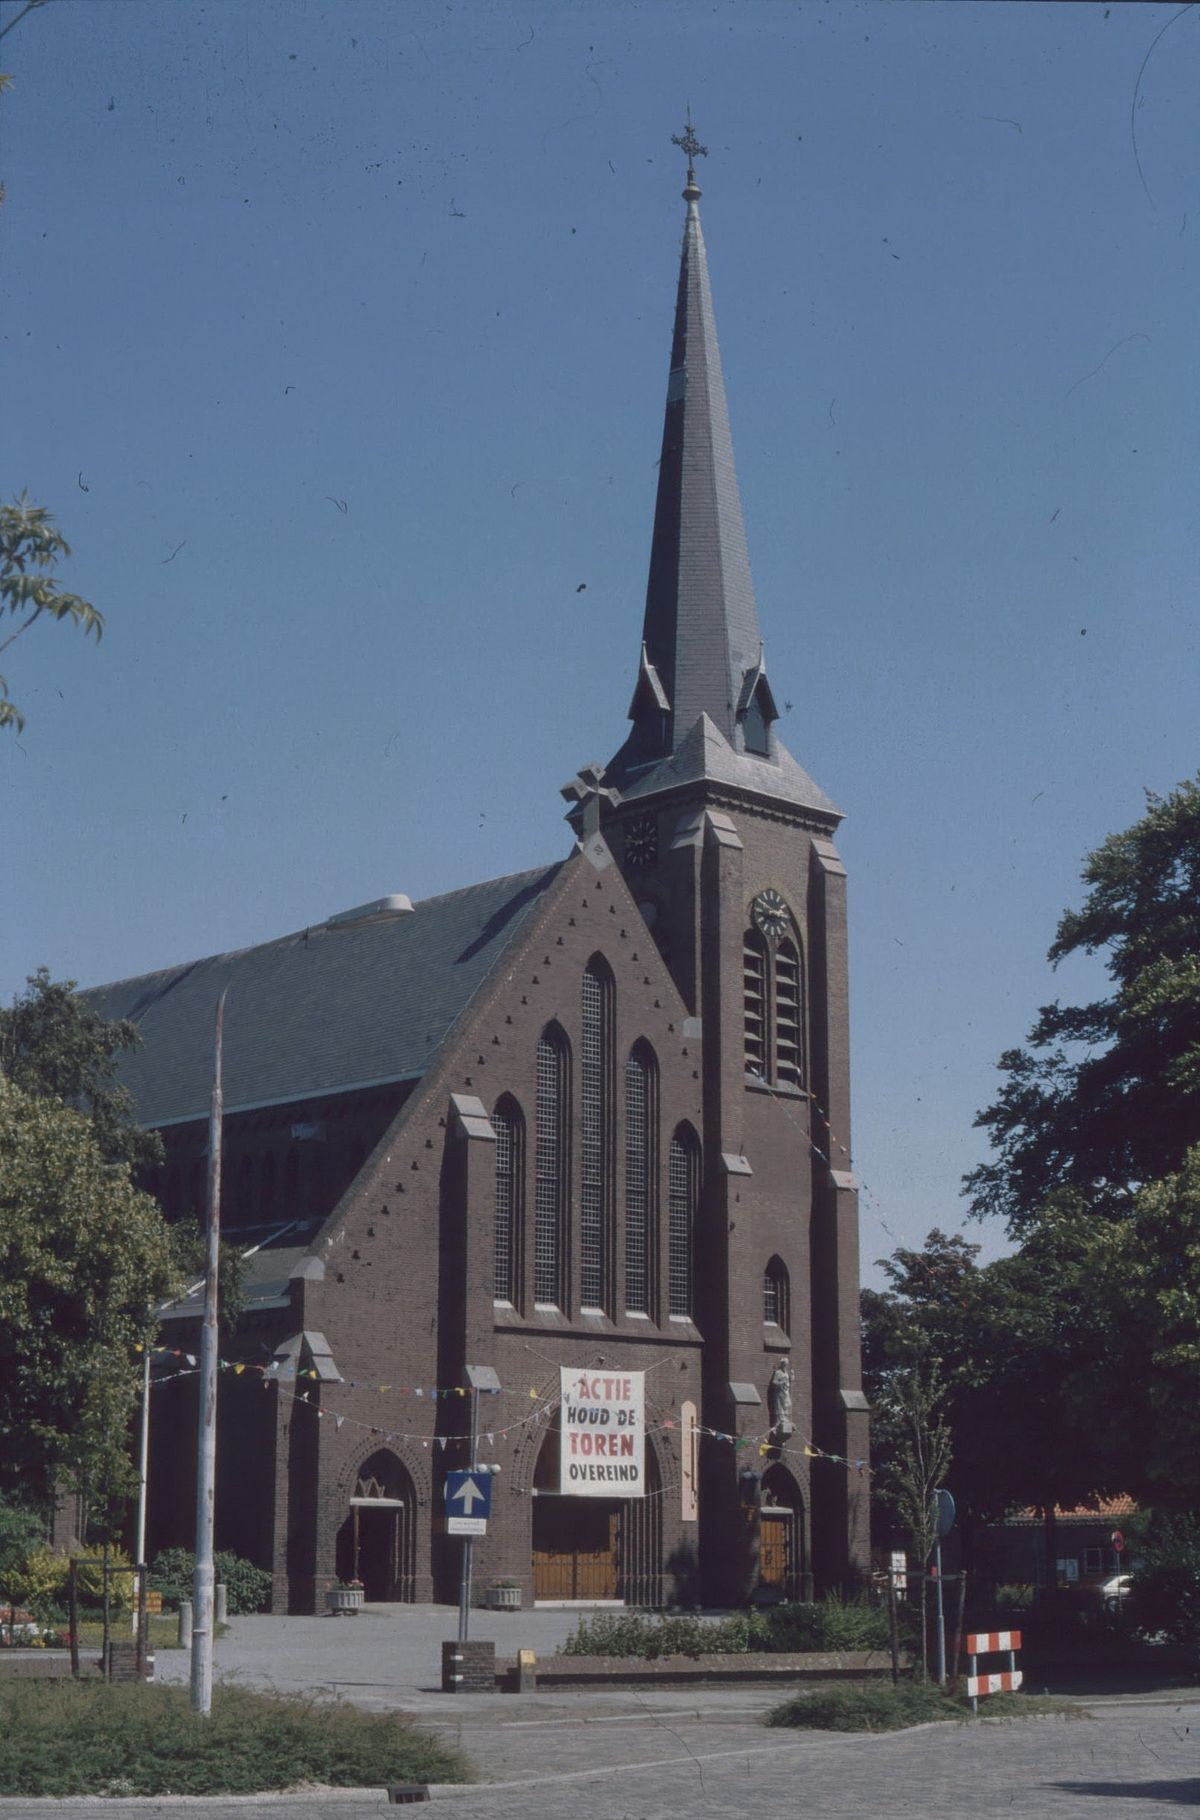 Sint-Martinuskerk (Hillegom) - Wikipedia